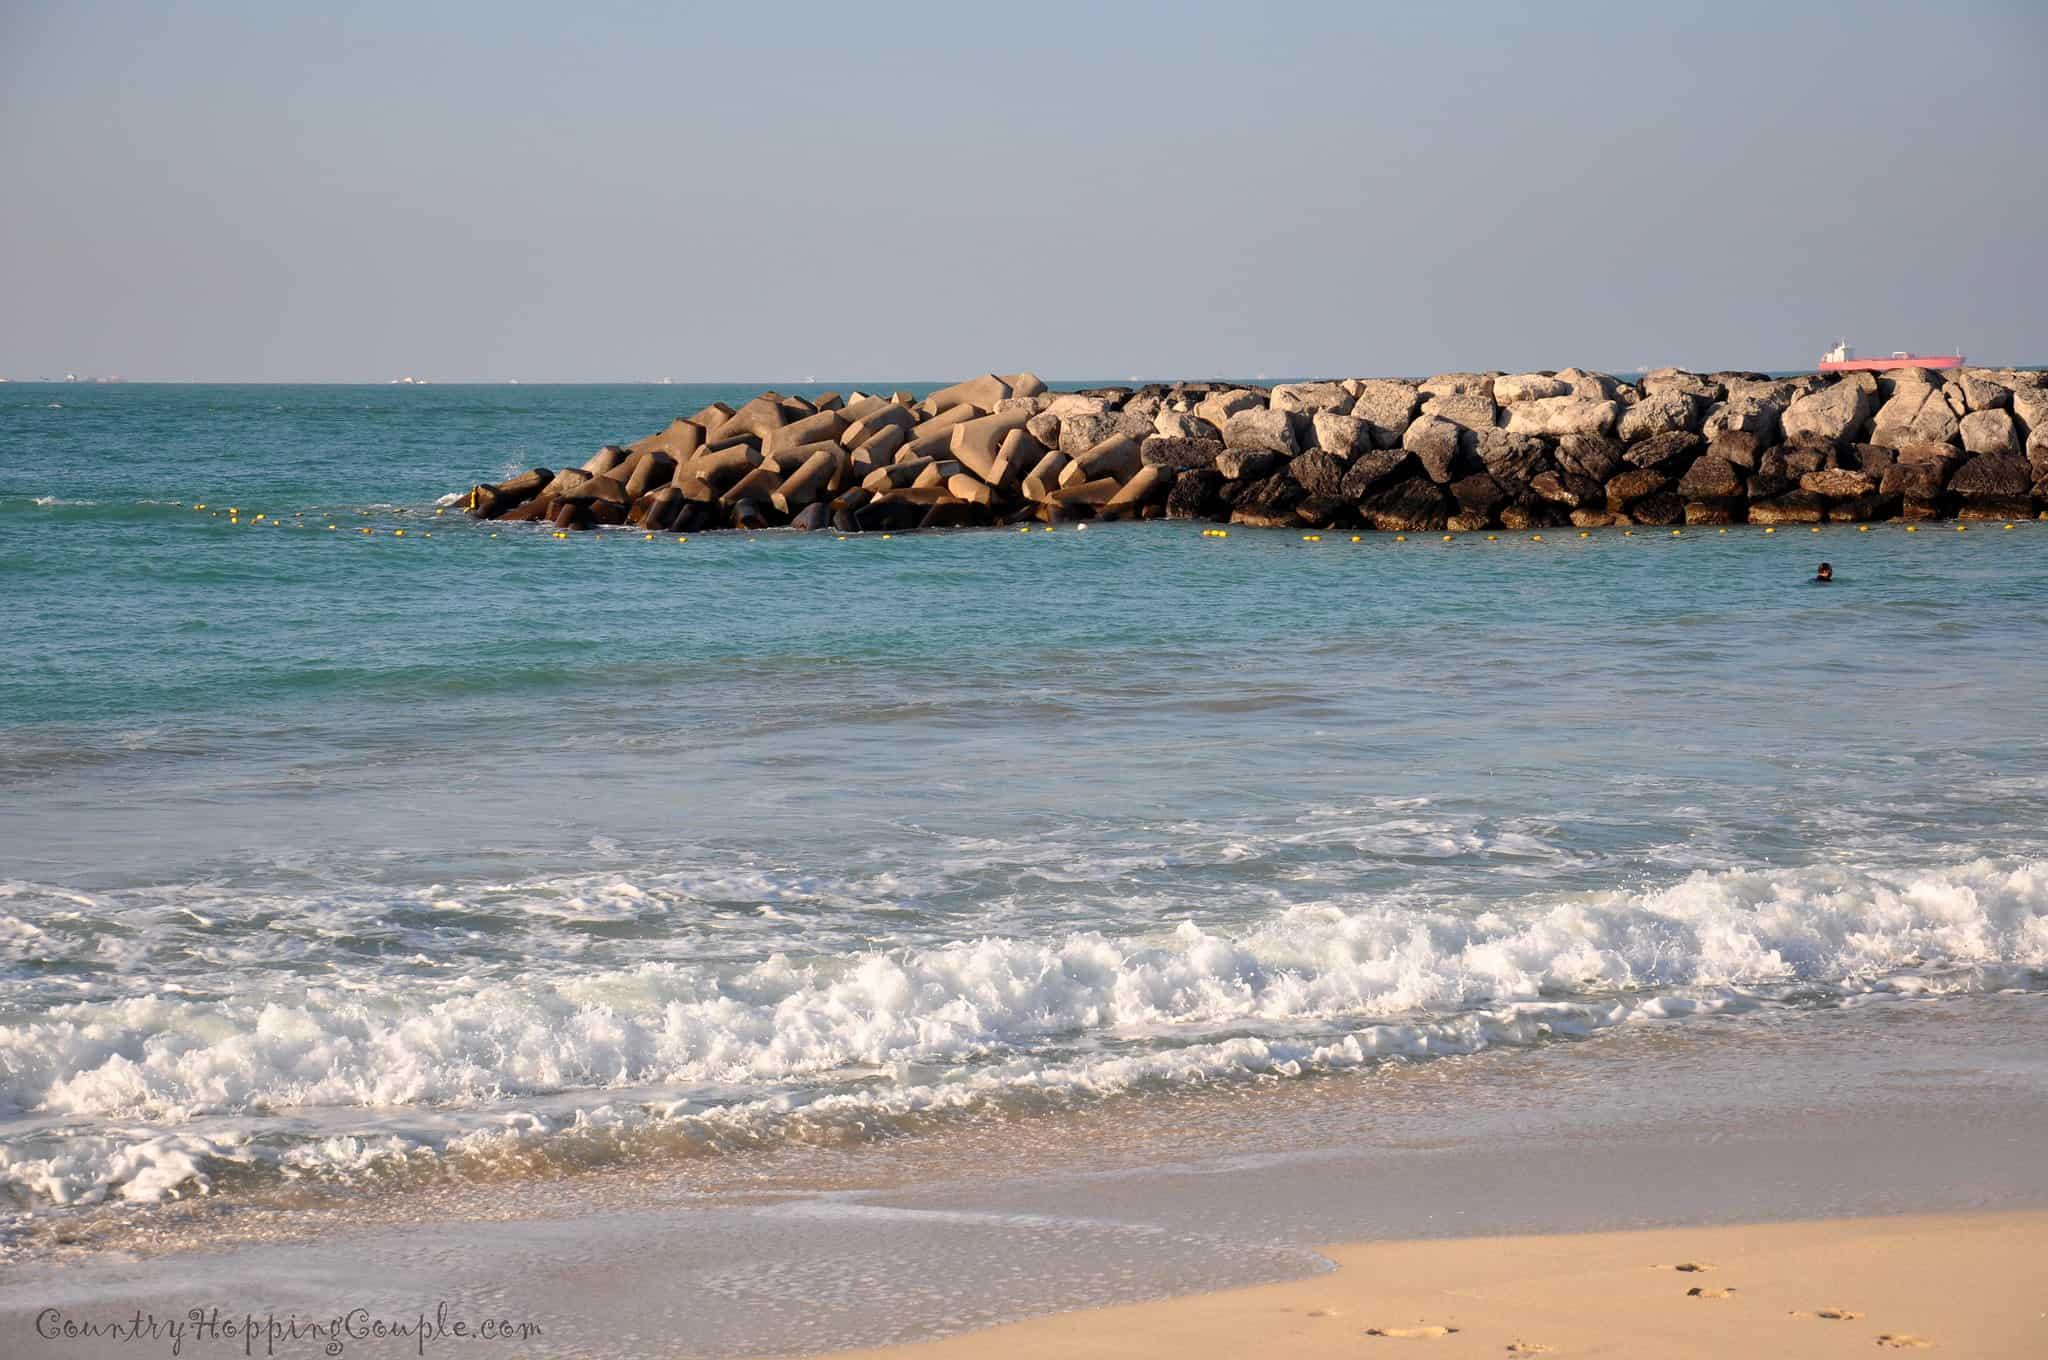 Al Mamzar Beach Park, an offbeat attraction in Dubai